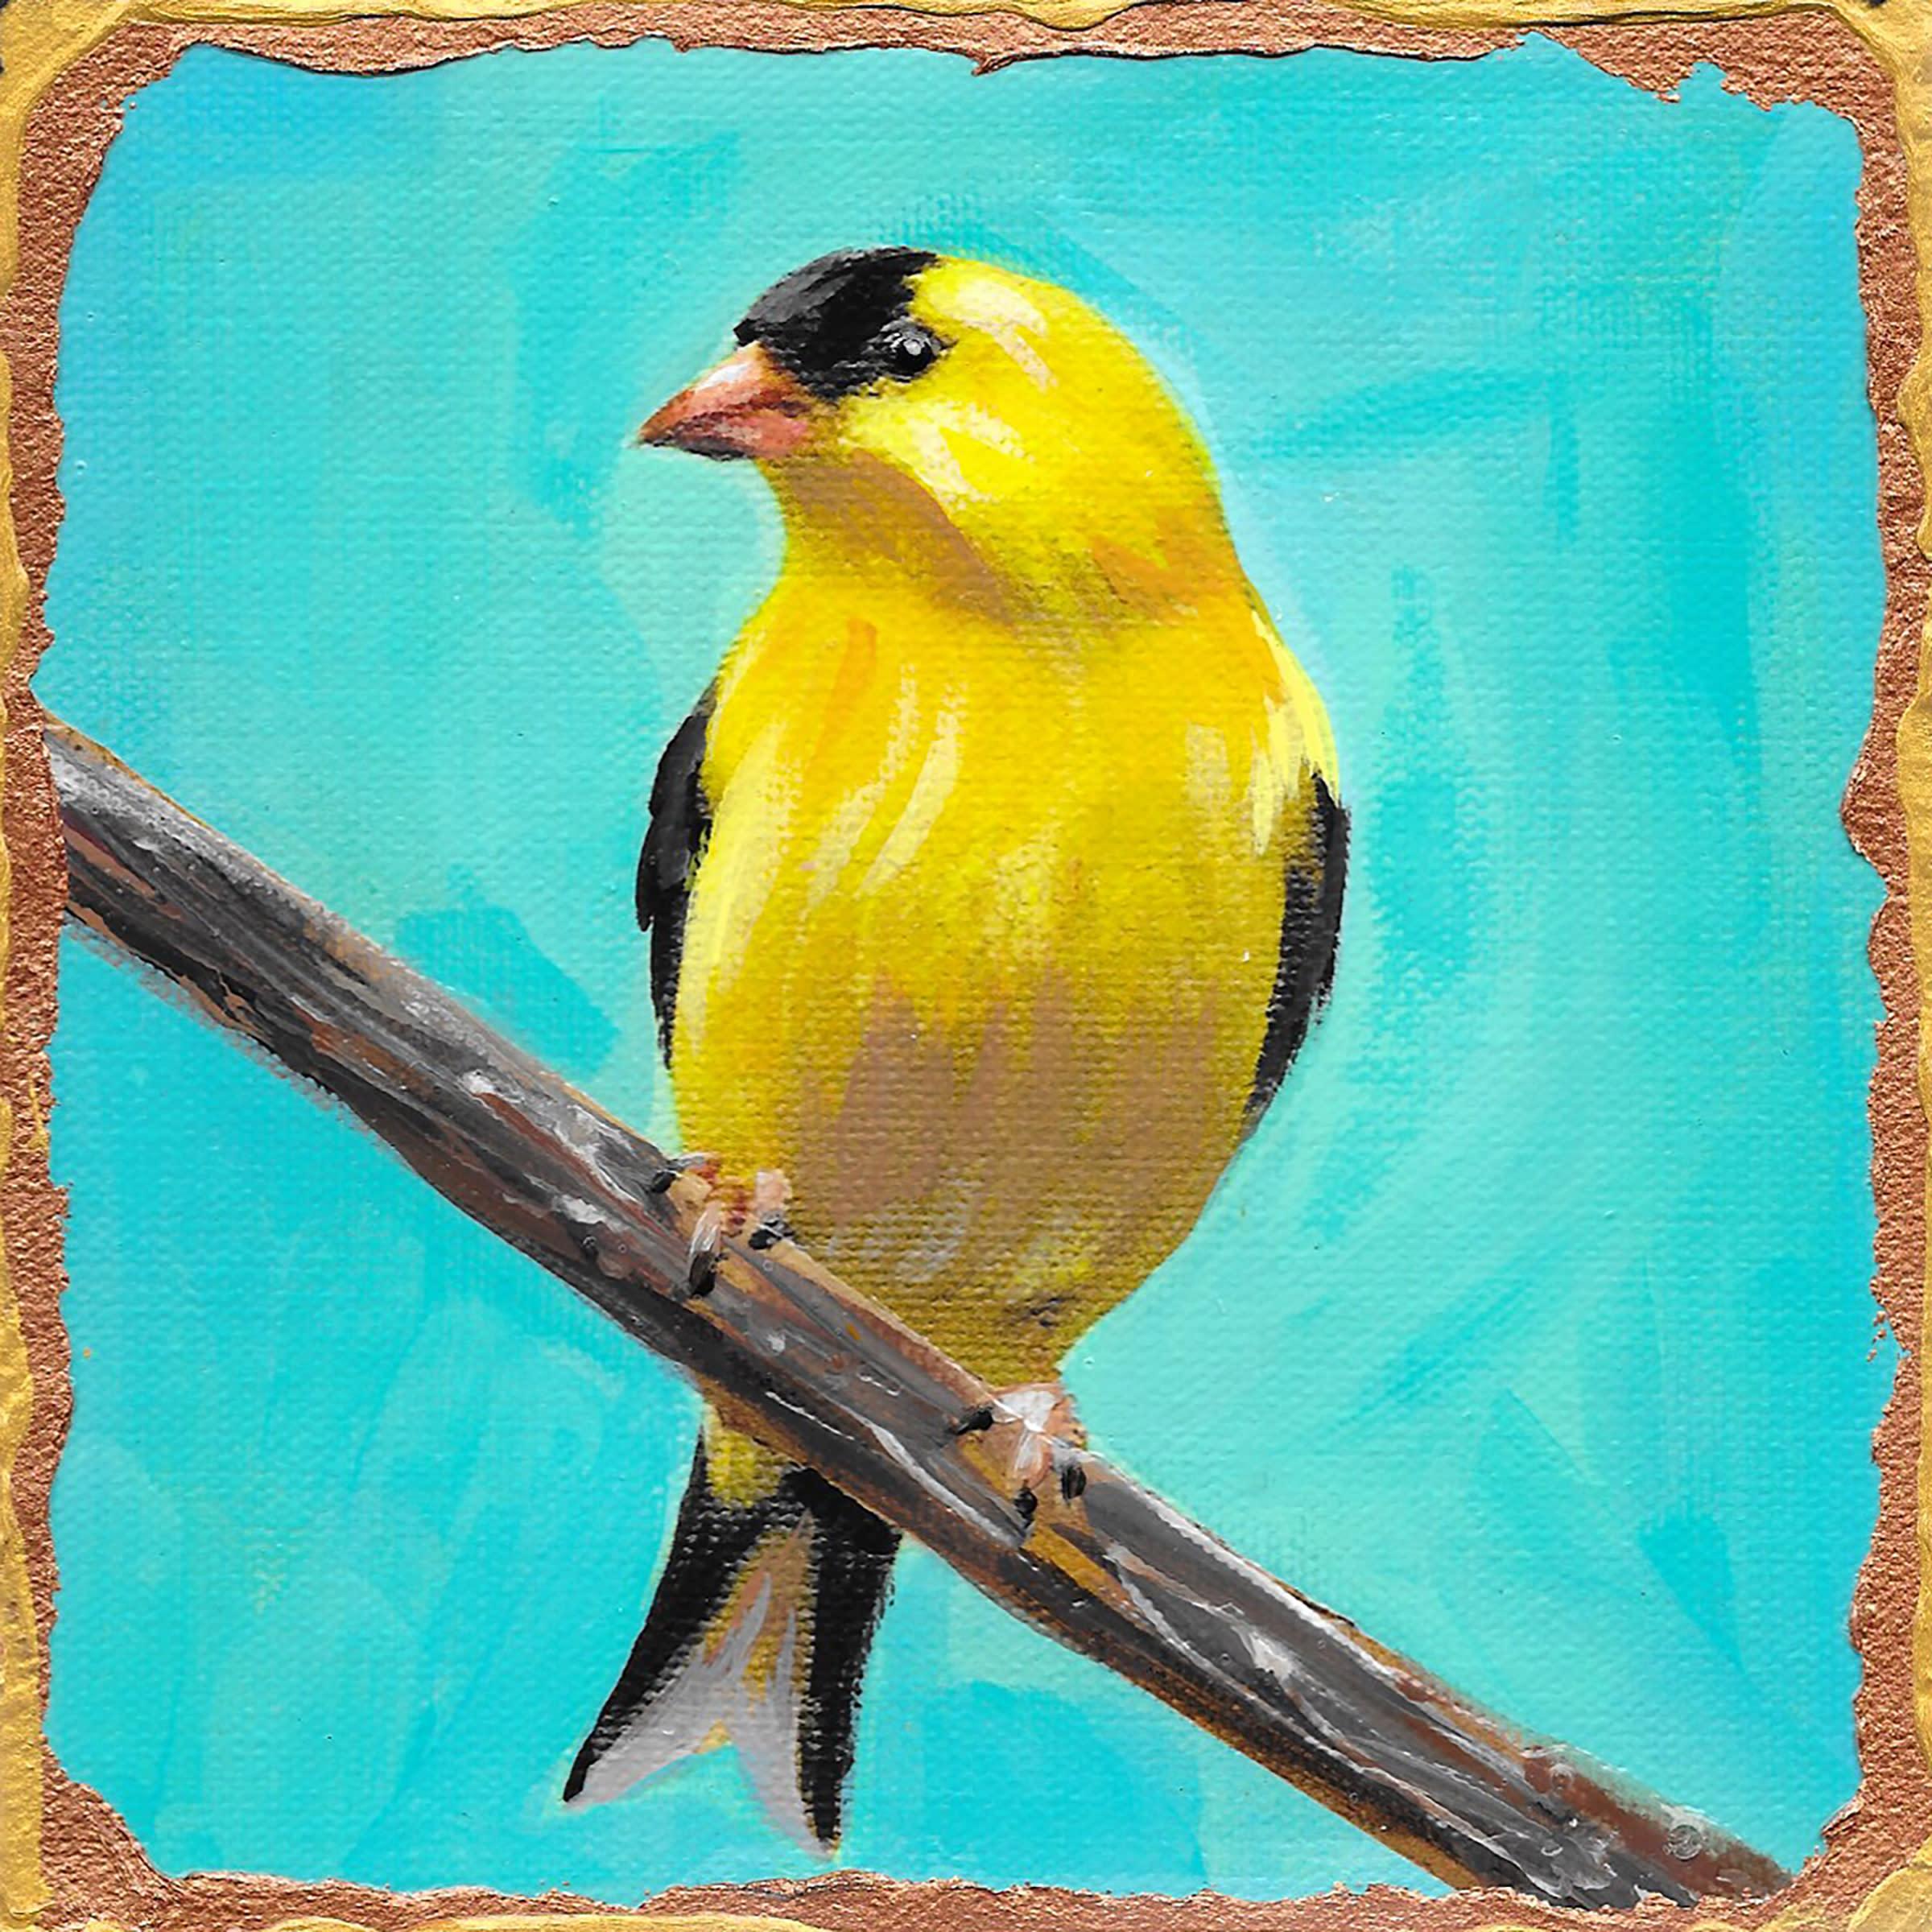 American goldfinch nrqkbu